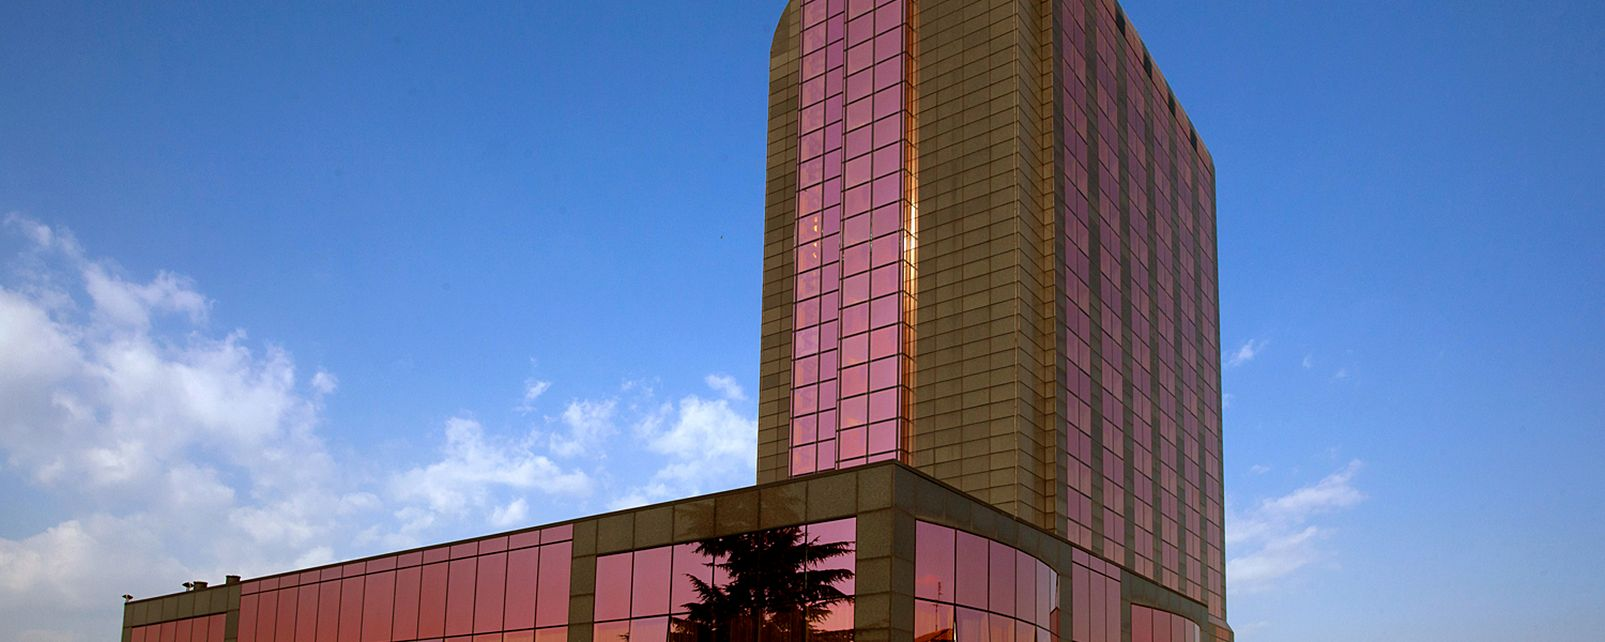 Hôtel Montresor Tower